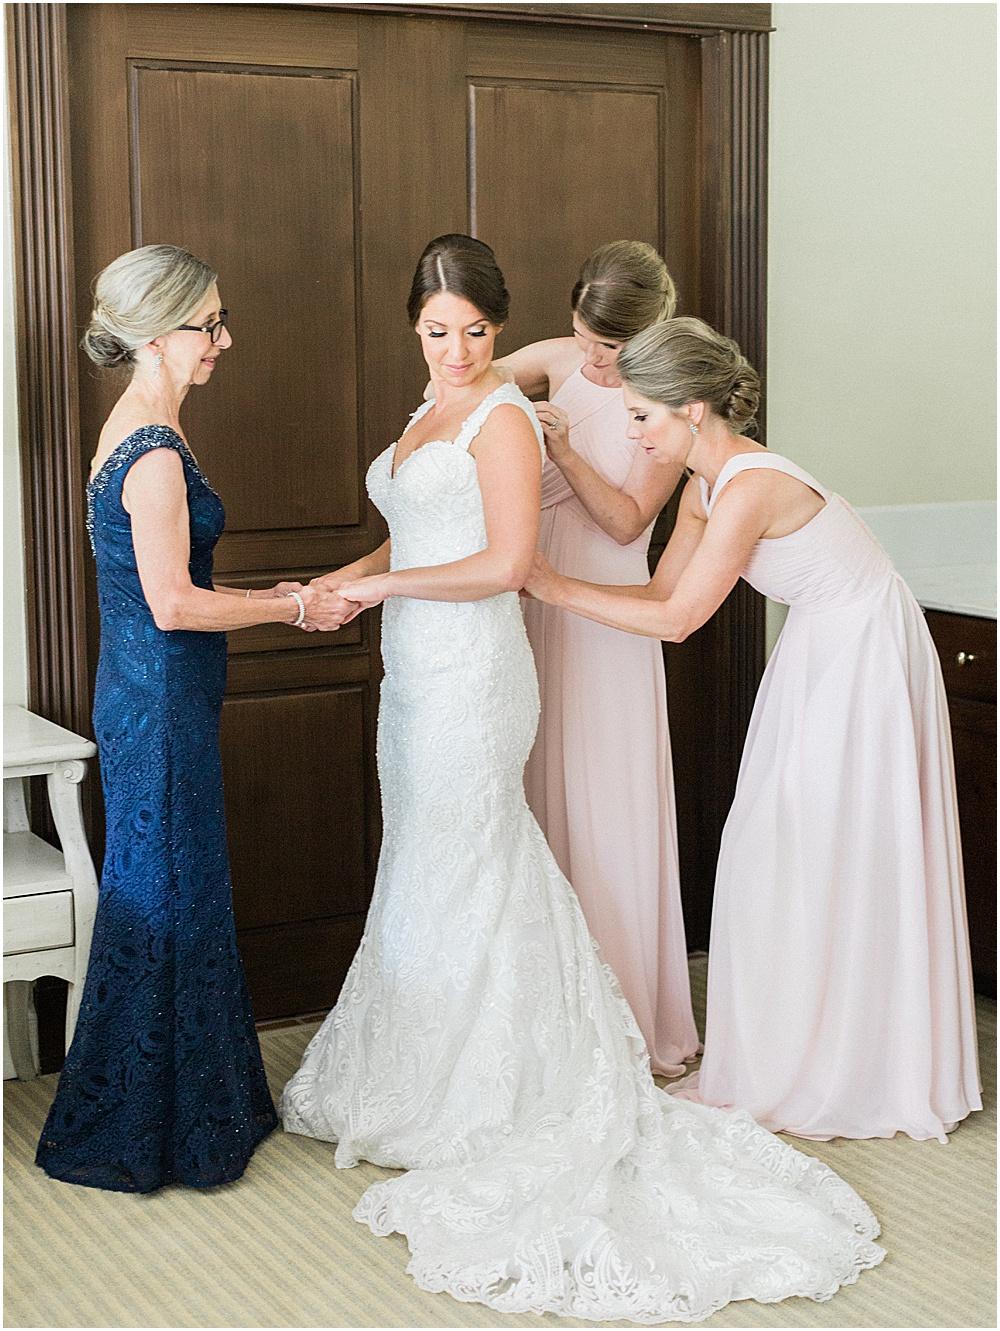 willowbend_country_club_colleen_brett_wild_dahlia_cw_events_cape_cod_massachusetts_boston_wedding_photographer_meredith_jane_photography_photo_0572.jpg